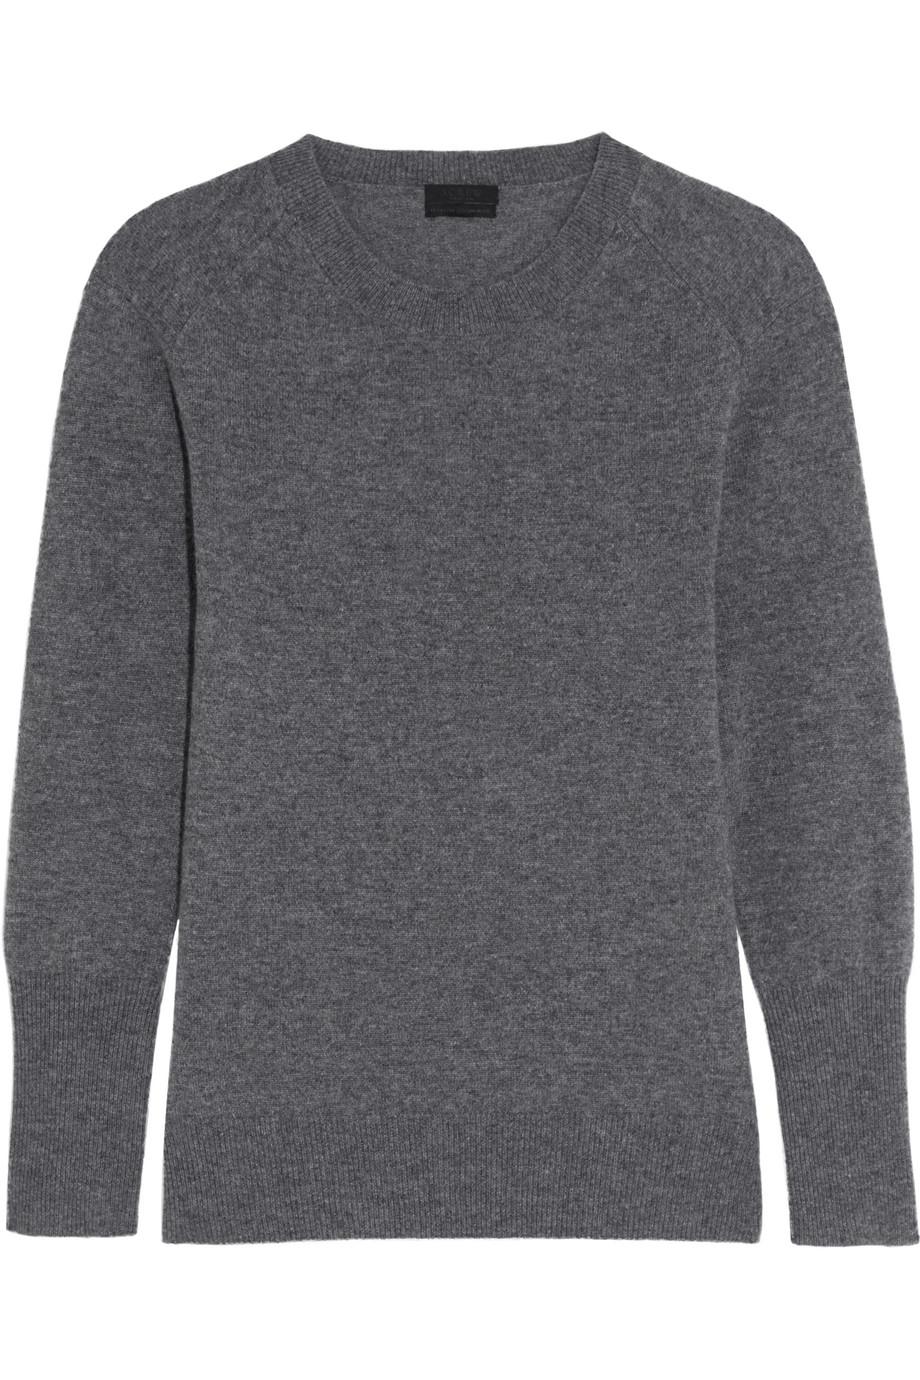 J.Crew Chenie Cashmere Sweater, Charcoal, Women's, Size: XL